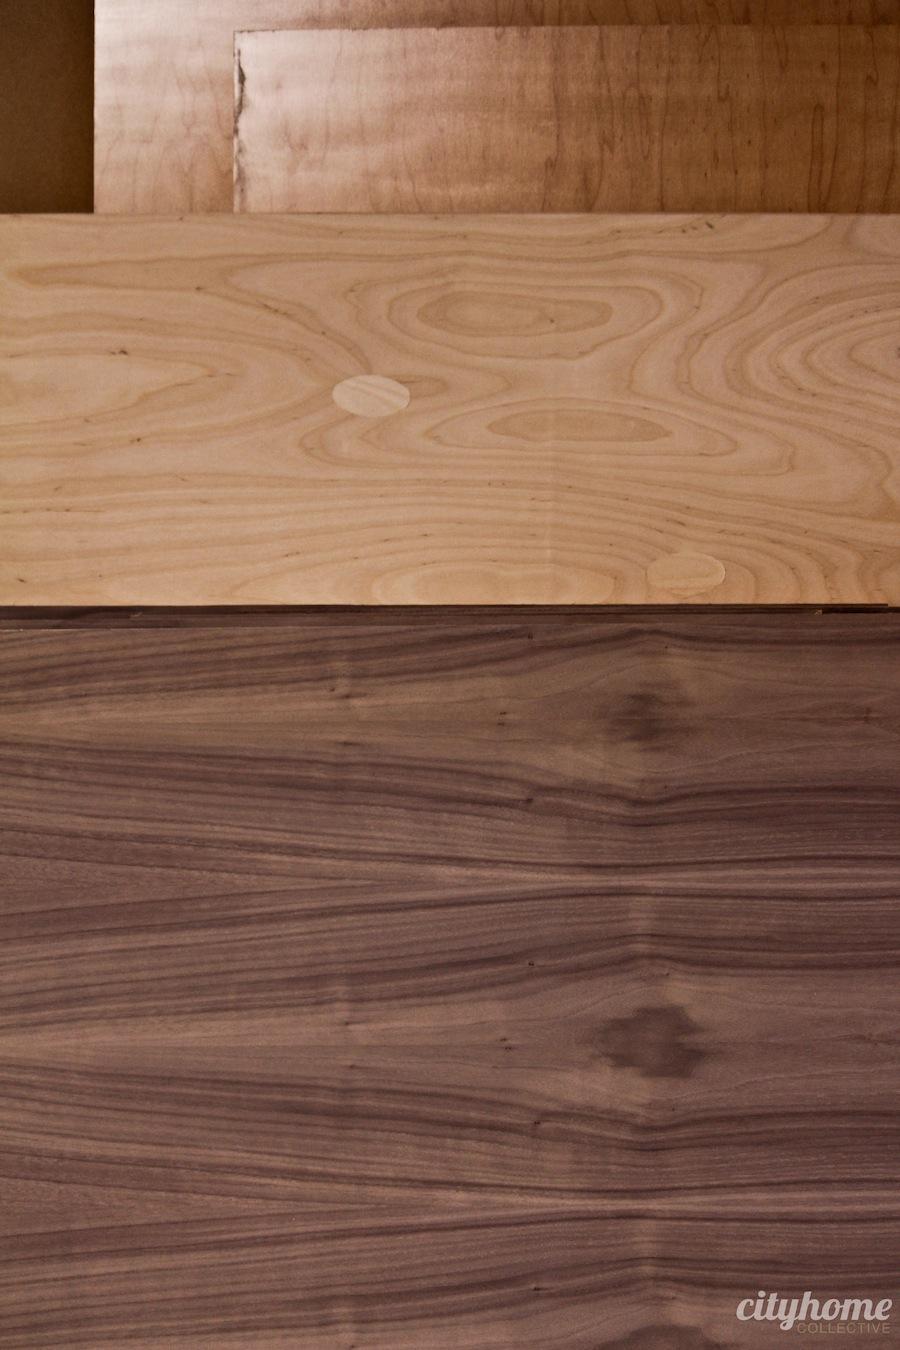 chamberlain-cabinetry-15